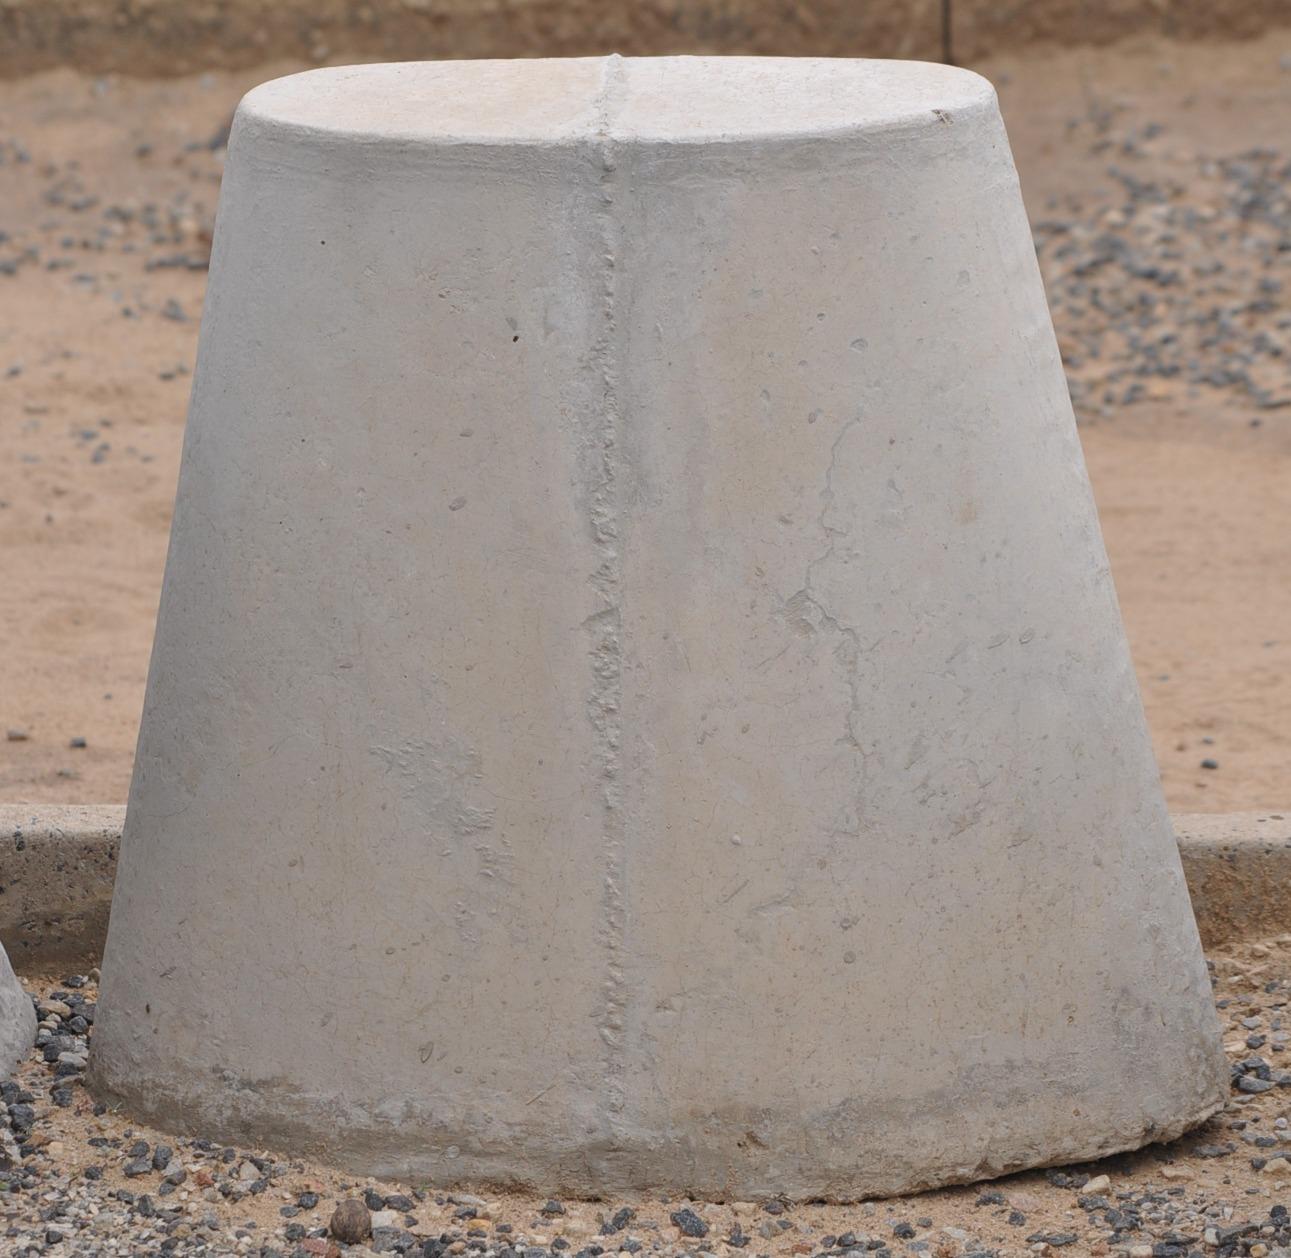 Oval bench leg